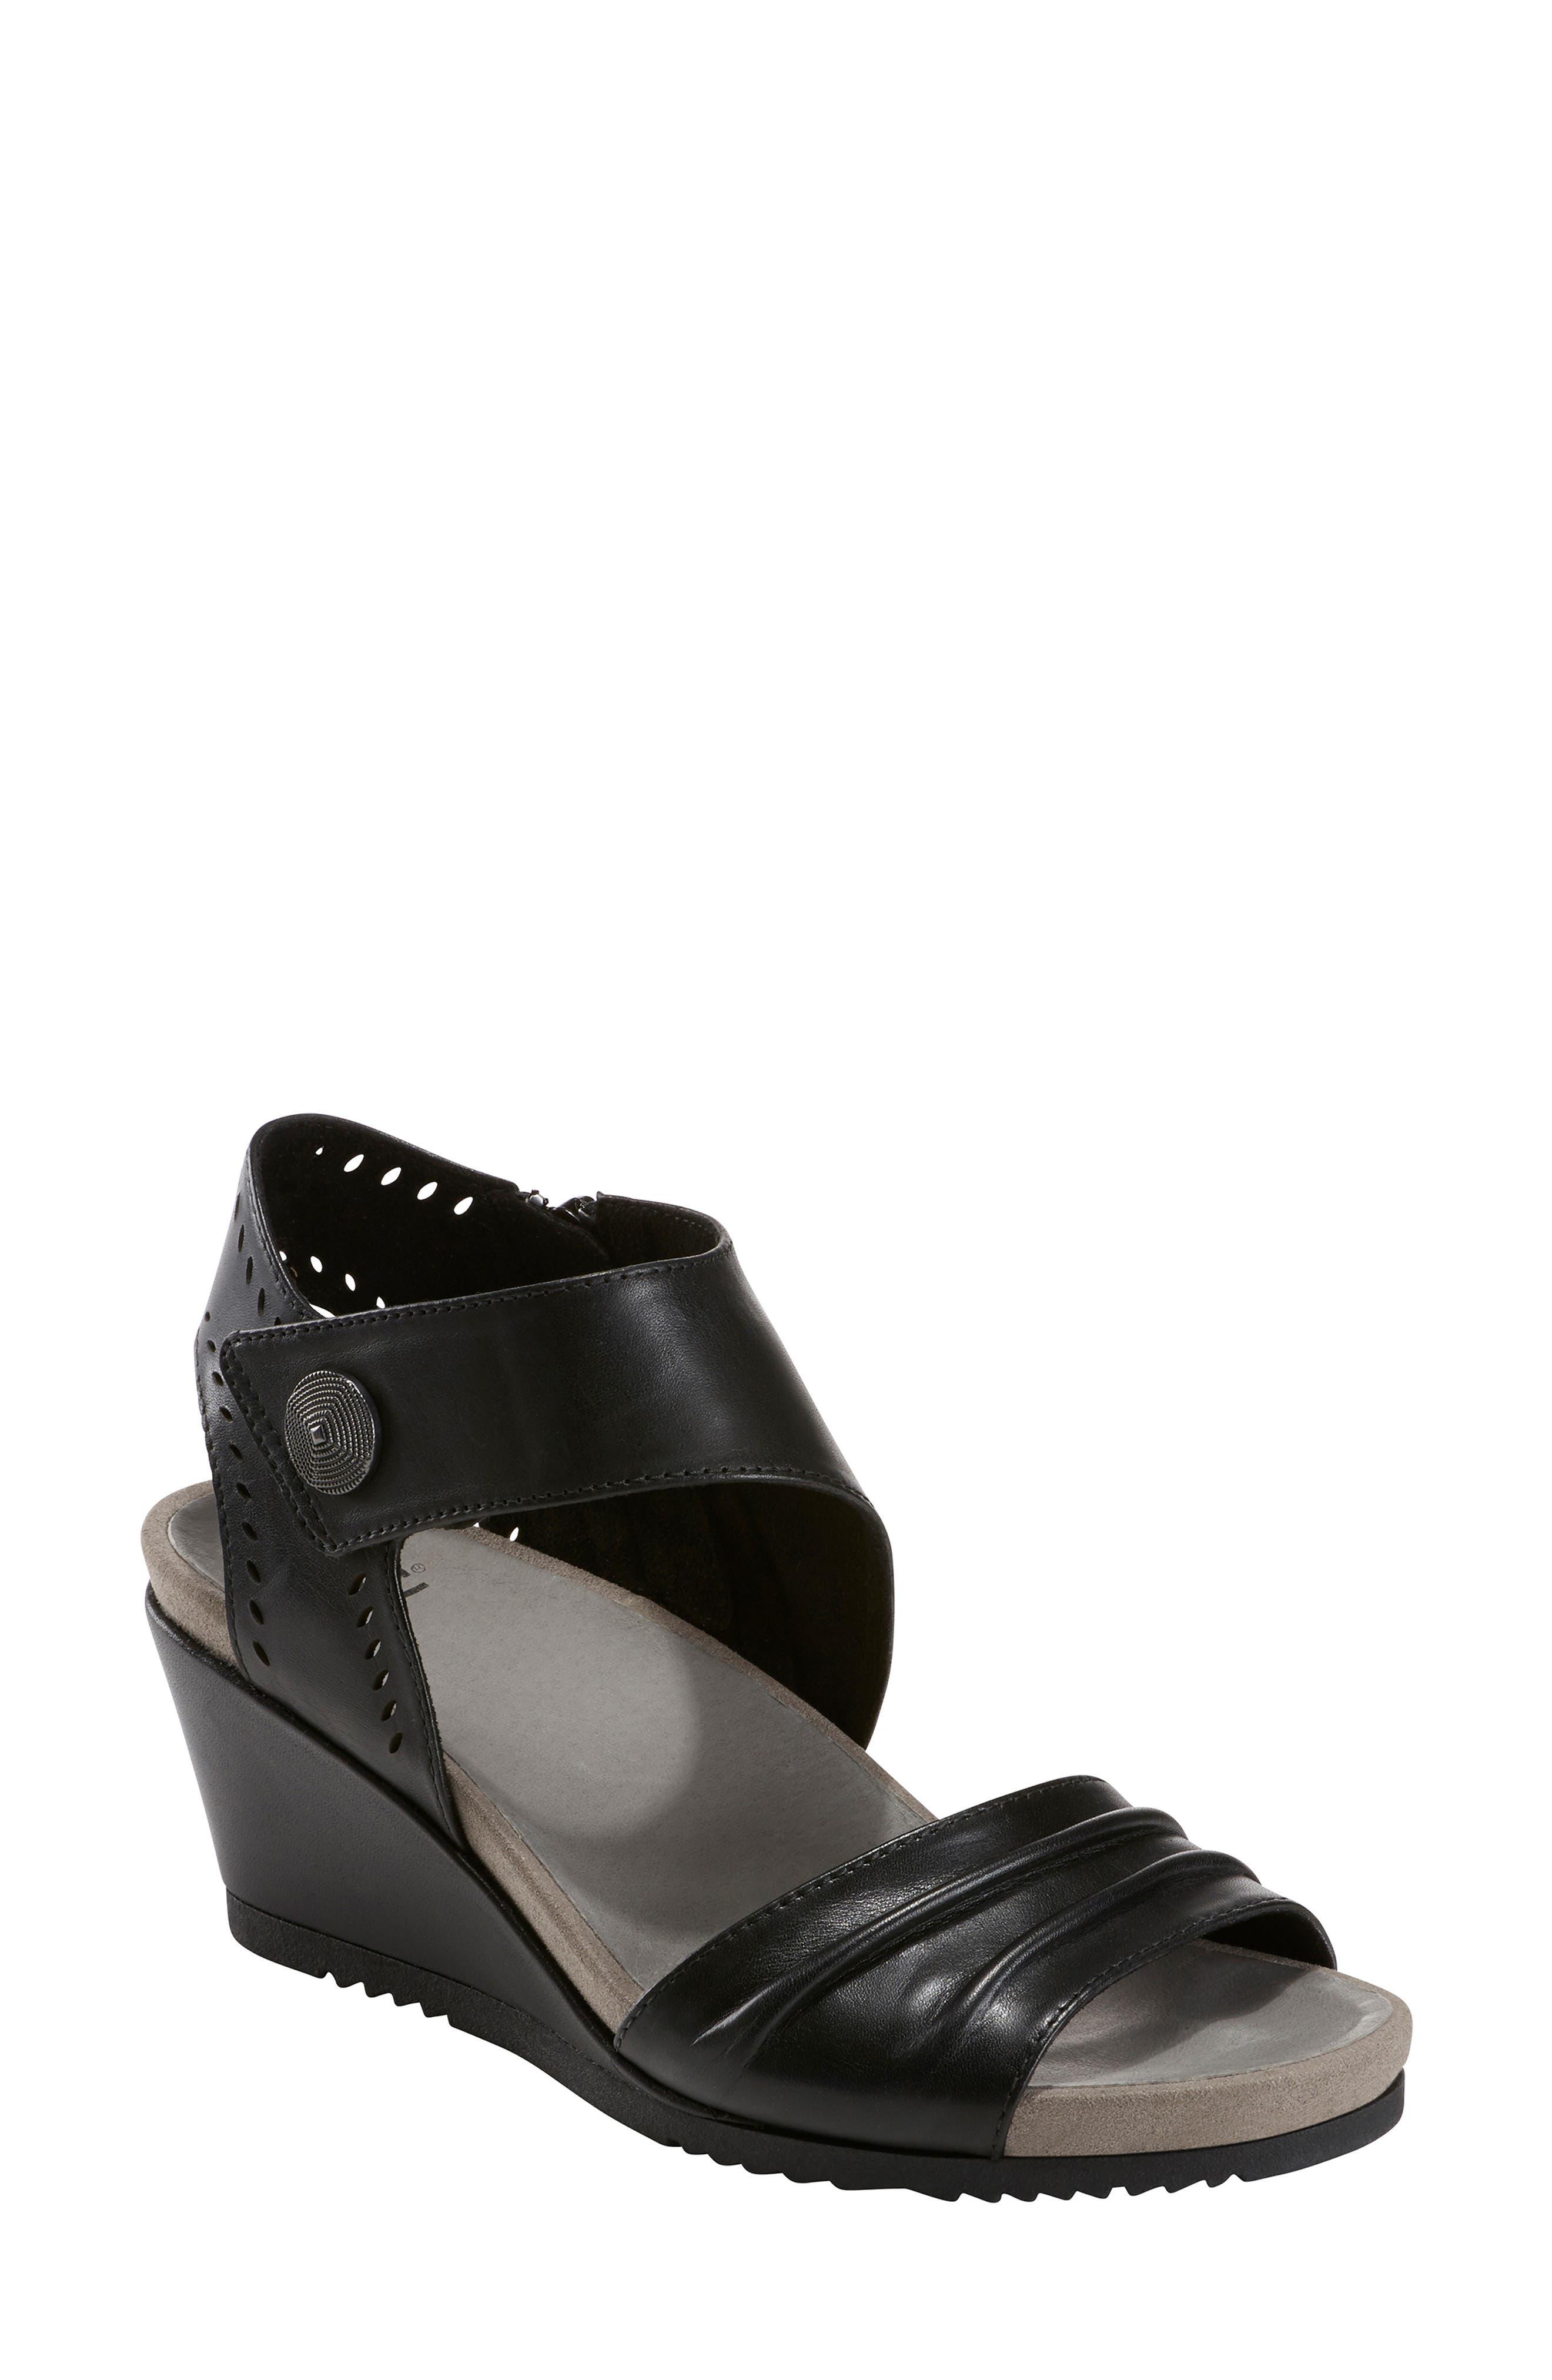 73635e1085571 Earth Barbados Wedge Sandal- Black